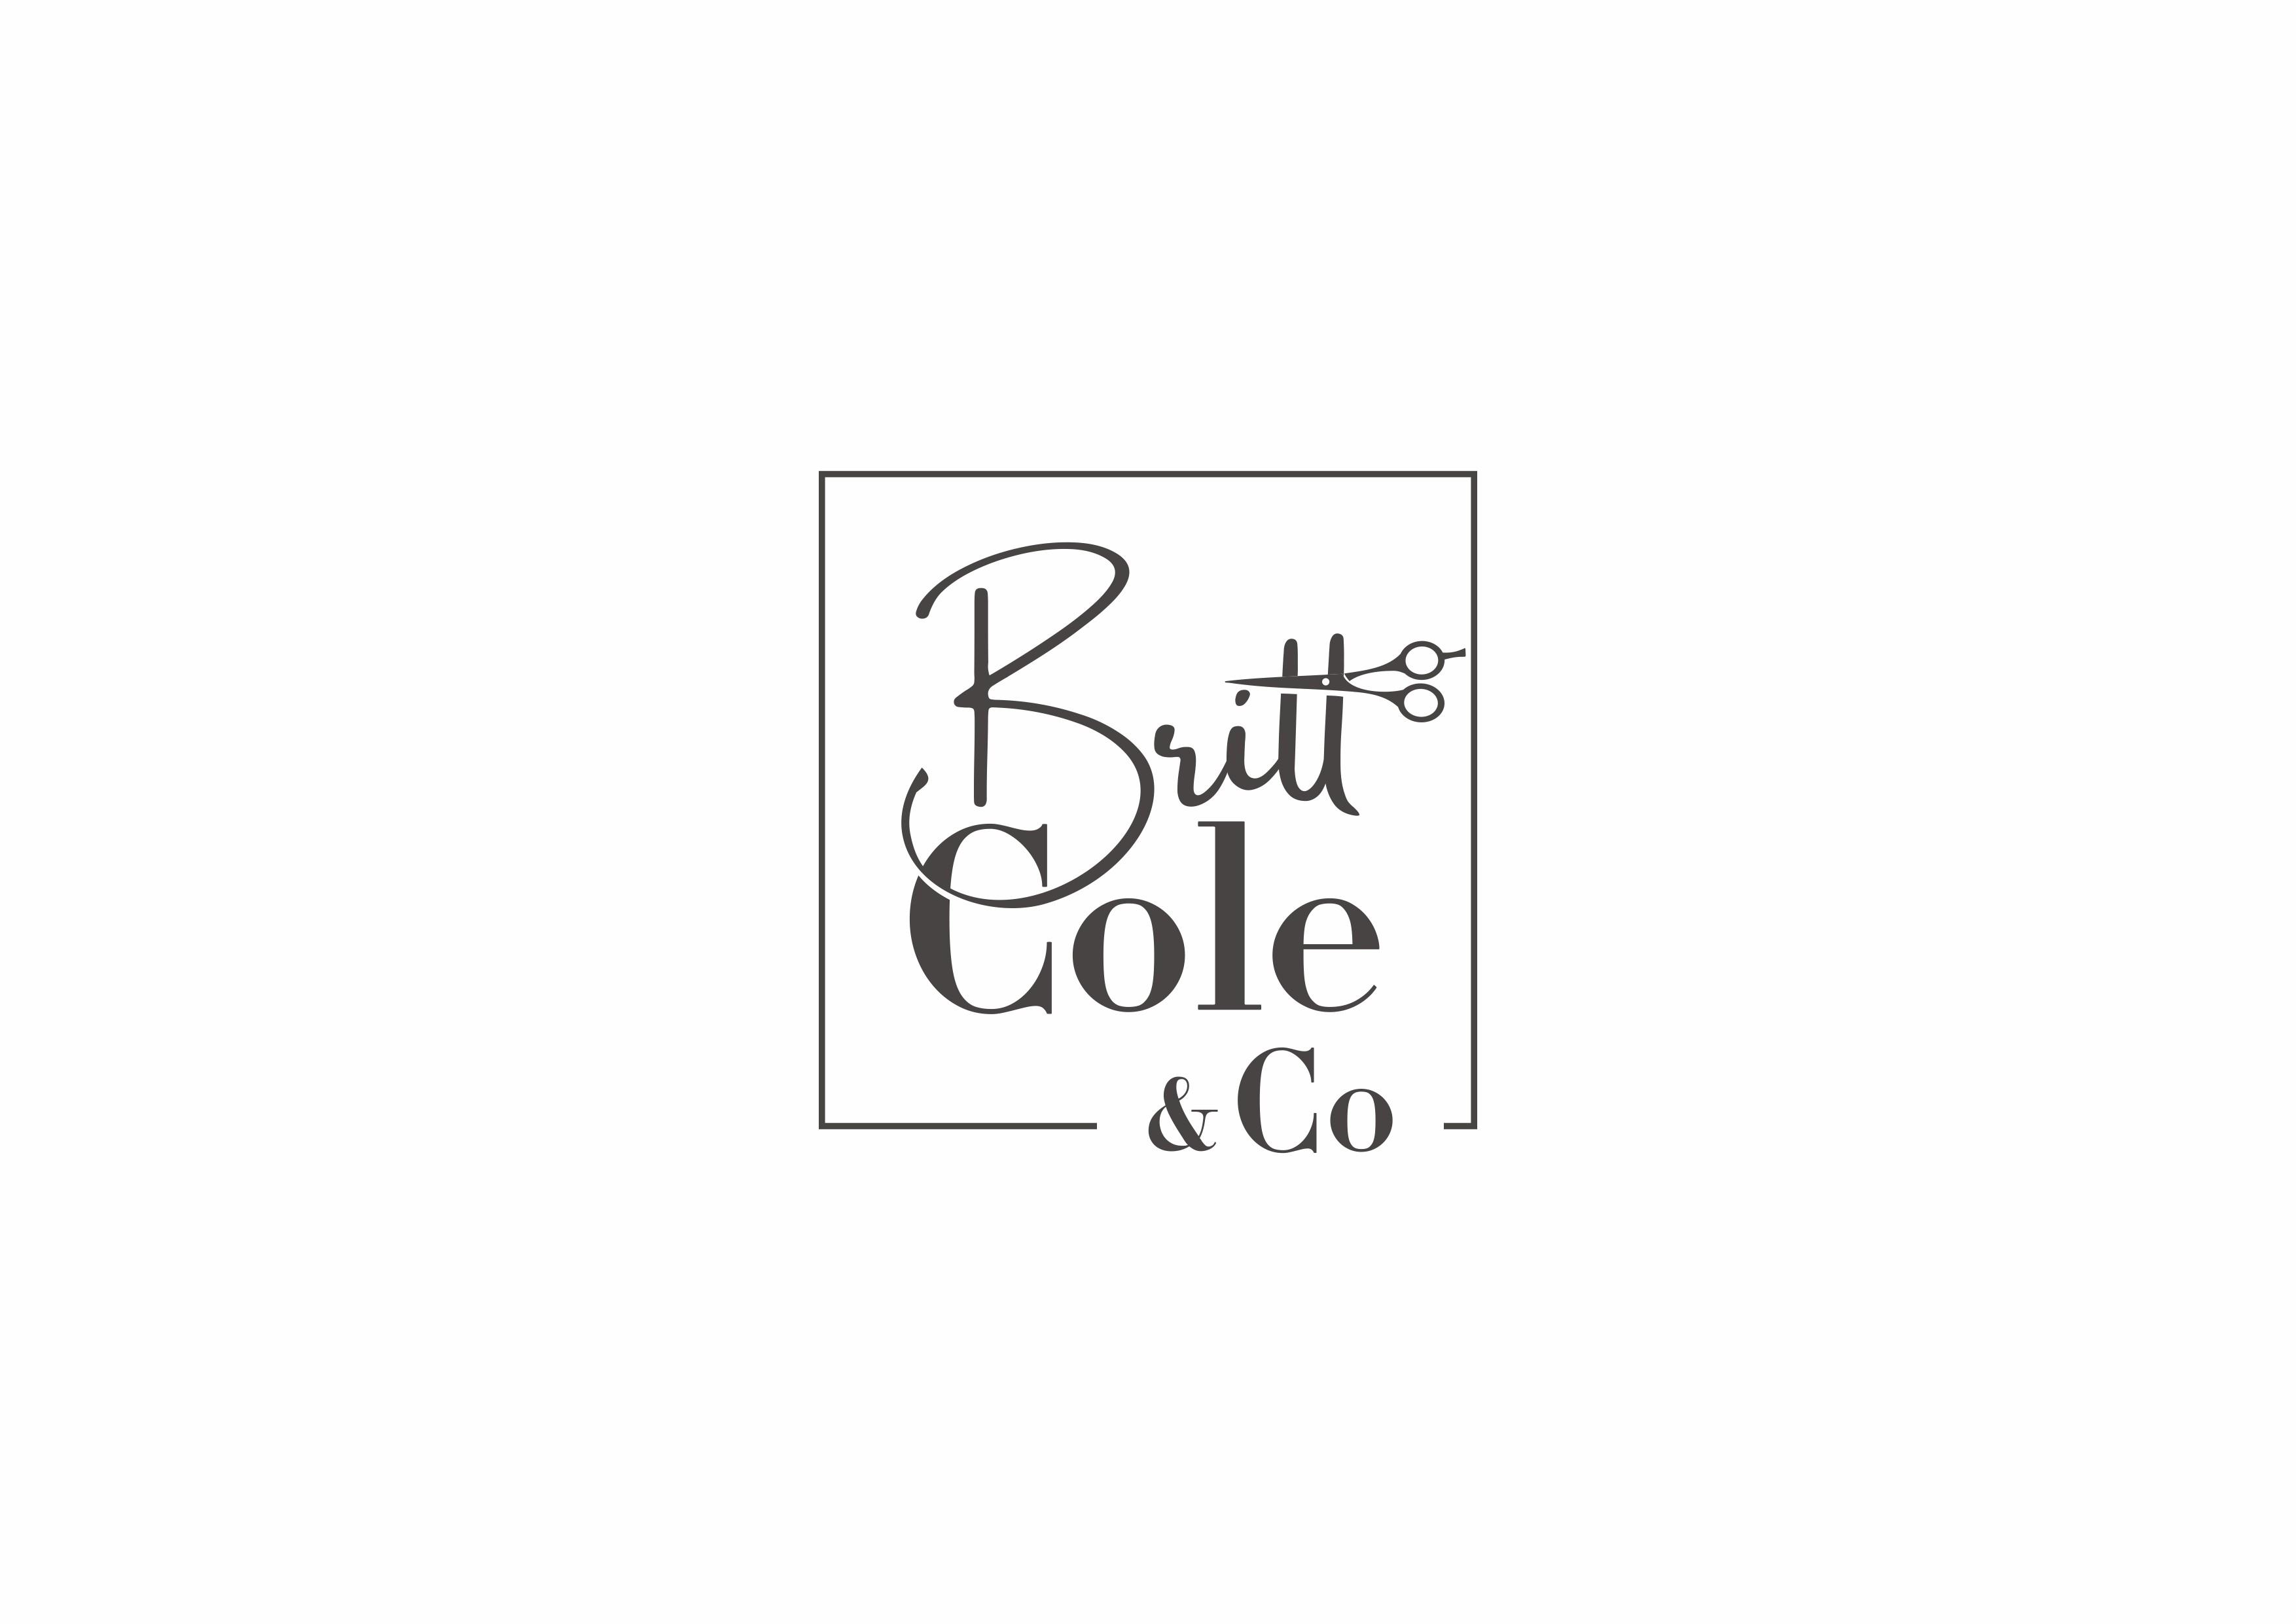 Creative salon seeking a knockout logo